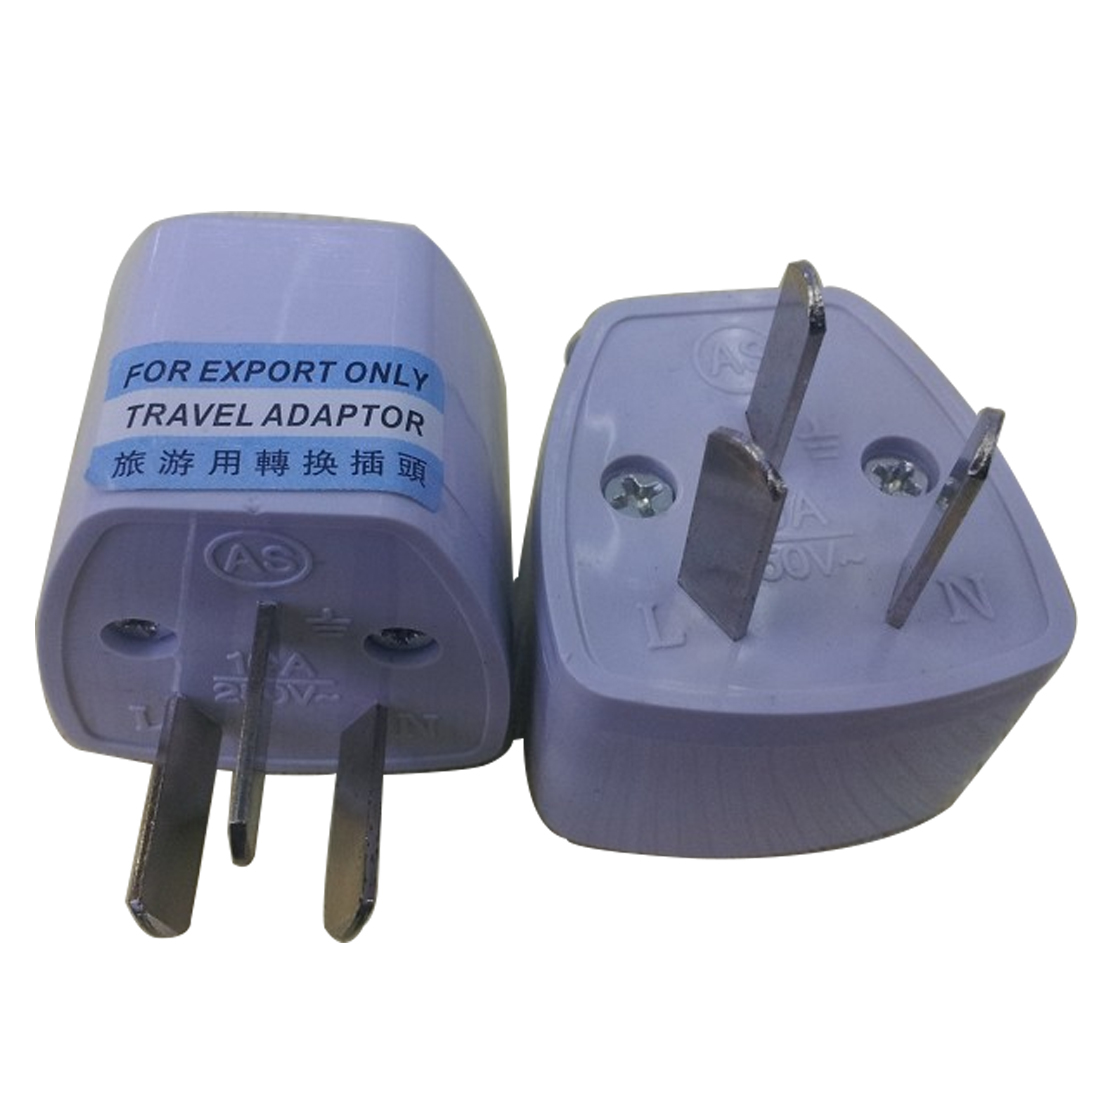 MAIF Top Universal Power Adapter Travel Adaptor 3 pin AU Converter US/UK/EU to AU Plug Charger For Australia Zealand